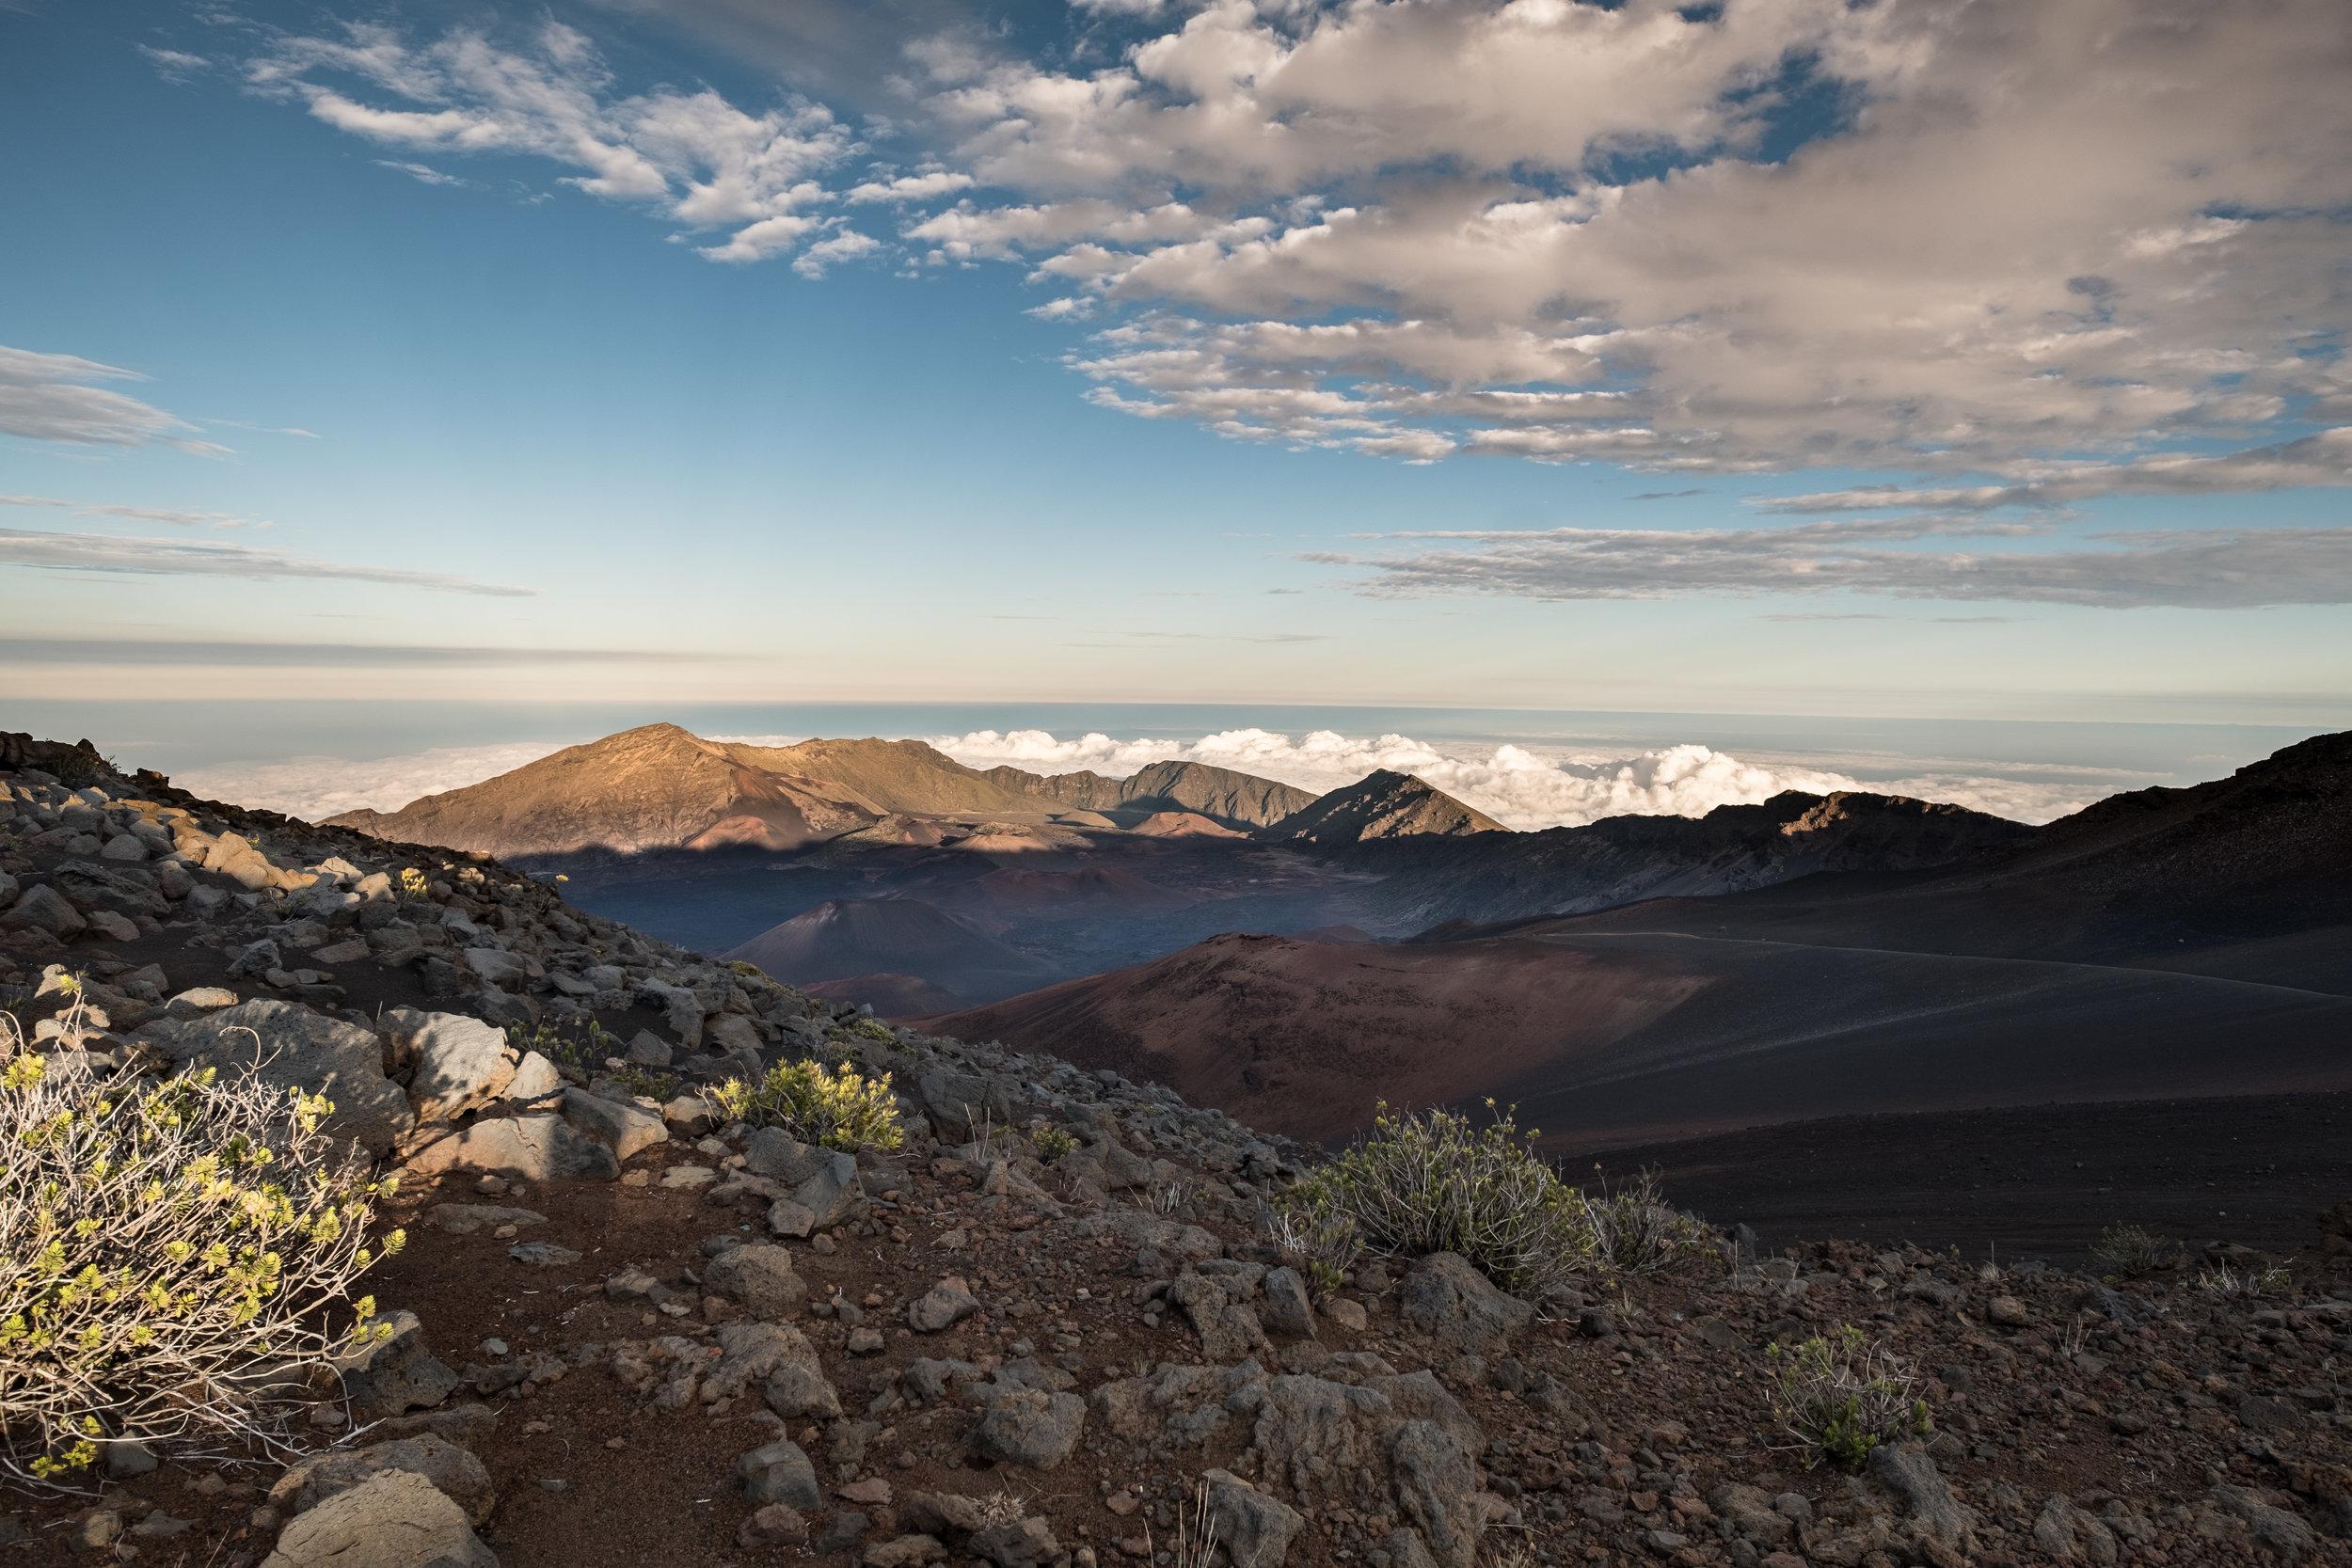 DSCF1859_Haleakala Crater.jpg